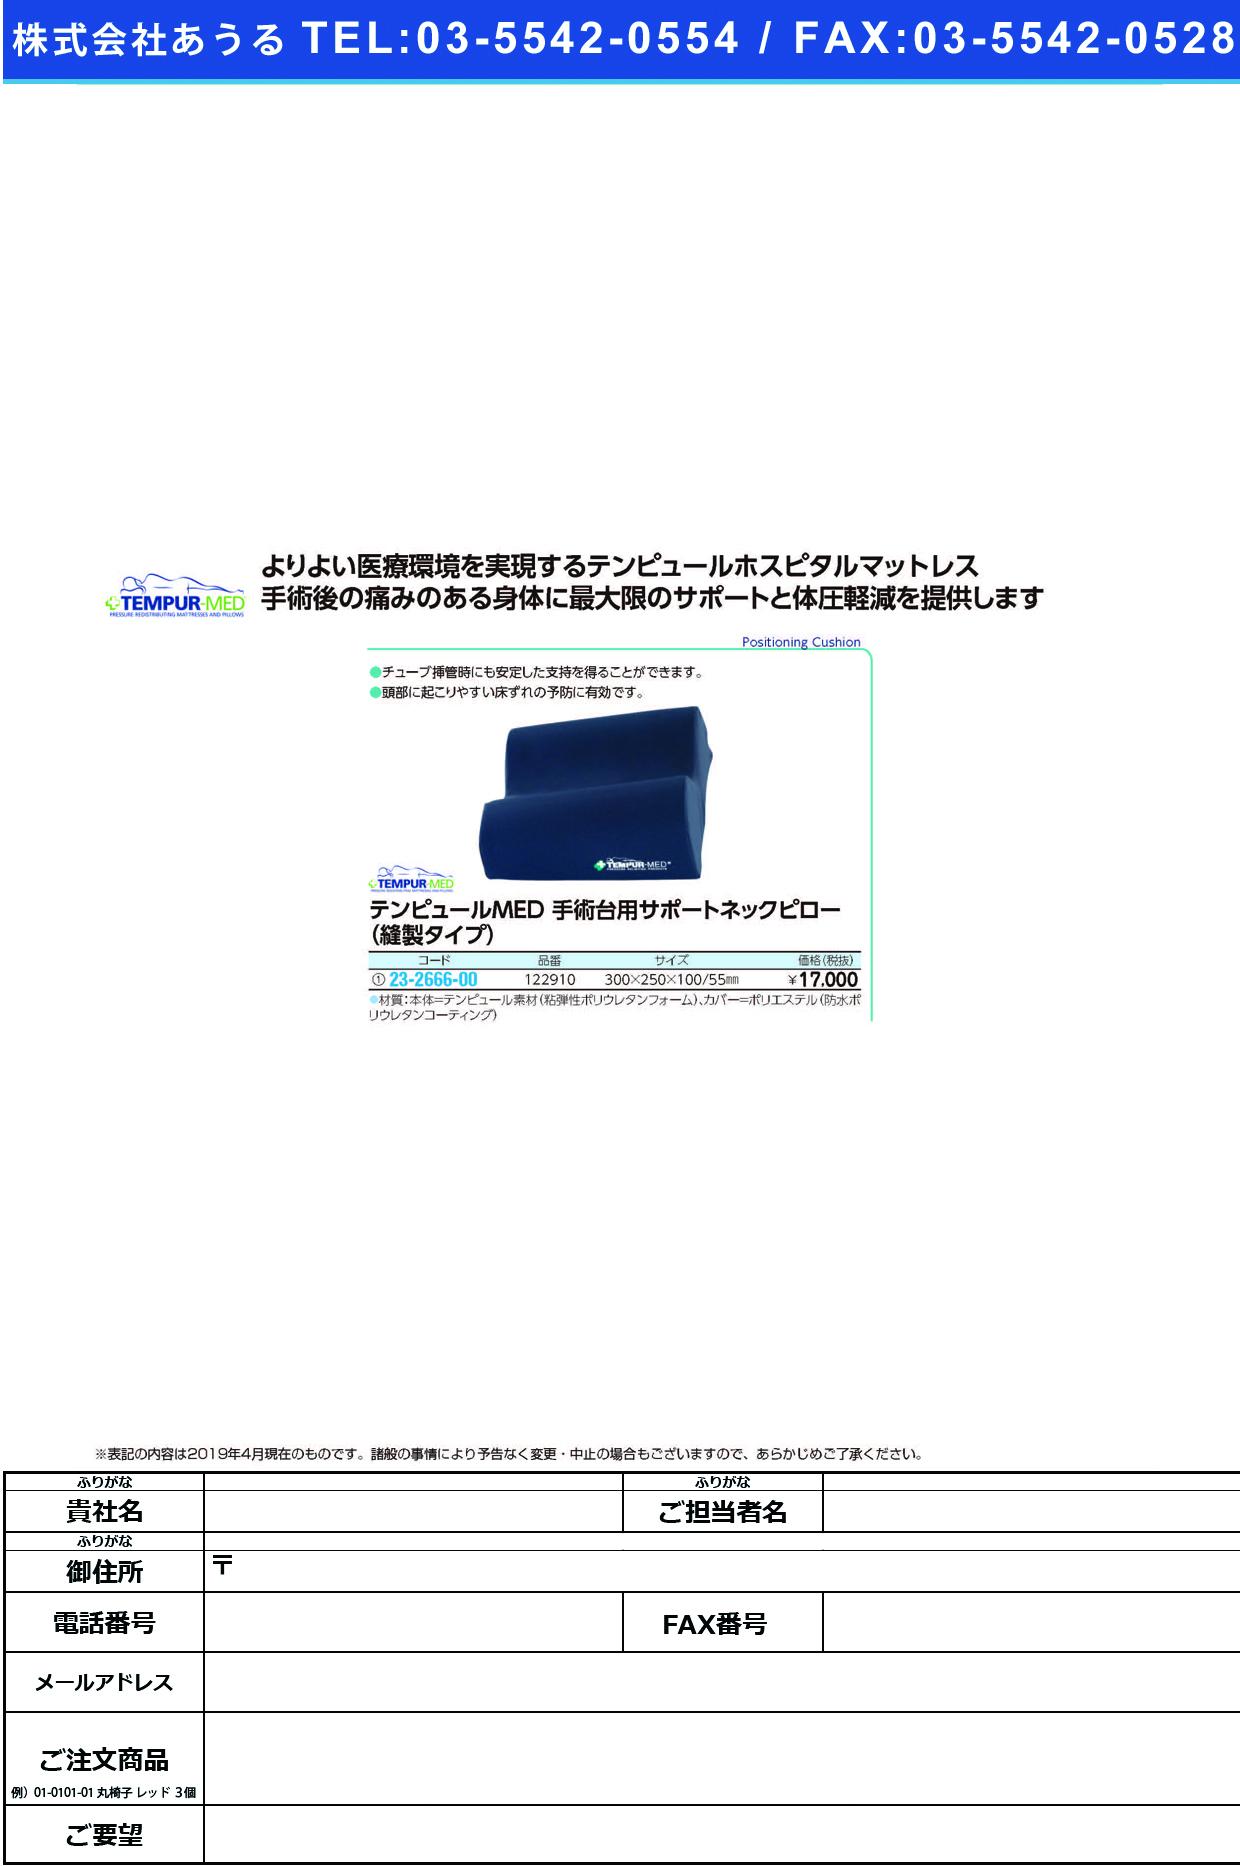 (23-2666-00)MED手術台用サポートネックピロー 122910(30X25X10/5.5 MEDサポートネックピロー(テンピュール・シーリー・ジャパン)【1個単位】【2019年カタログ商品】